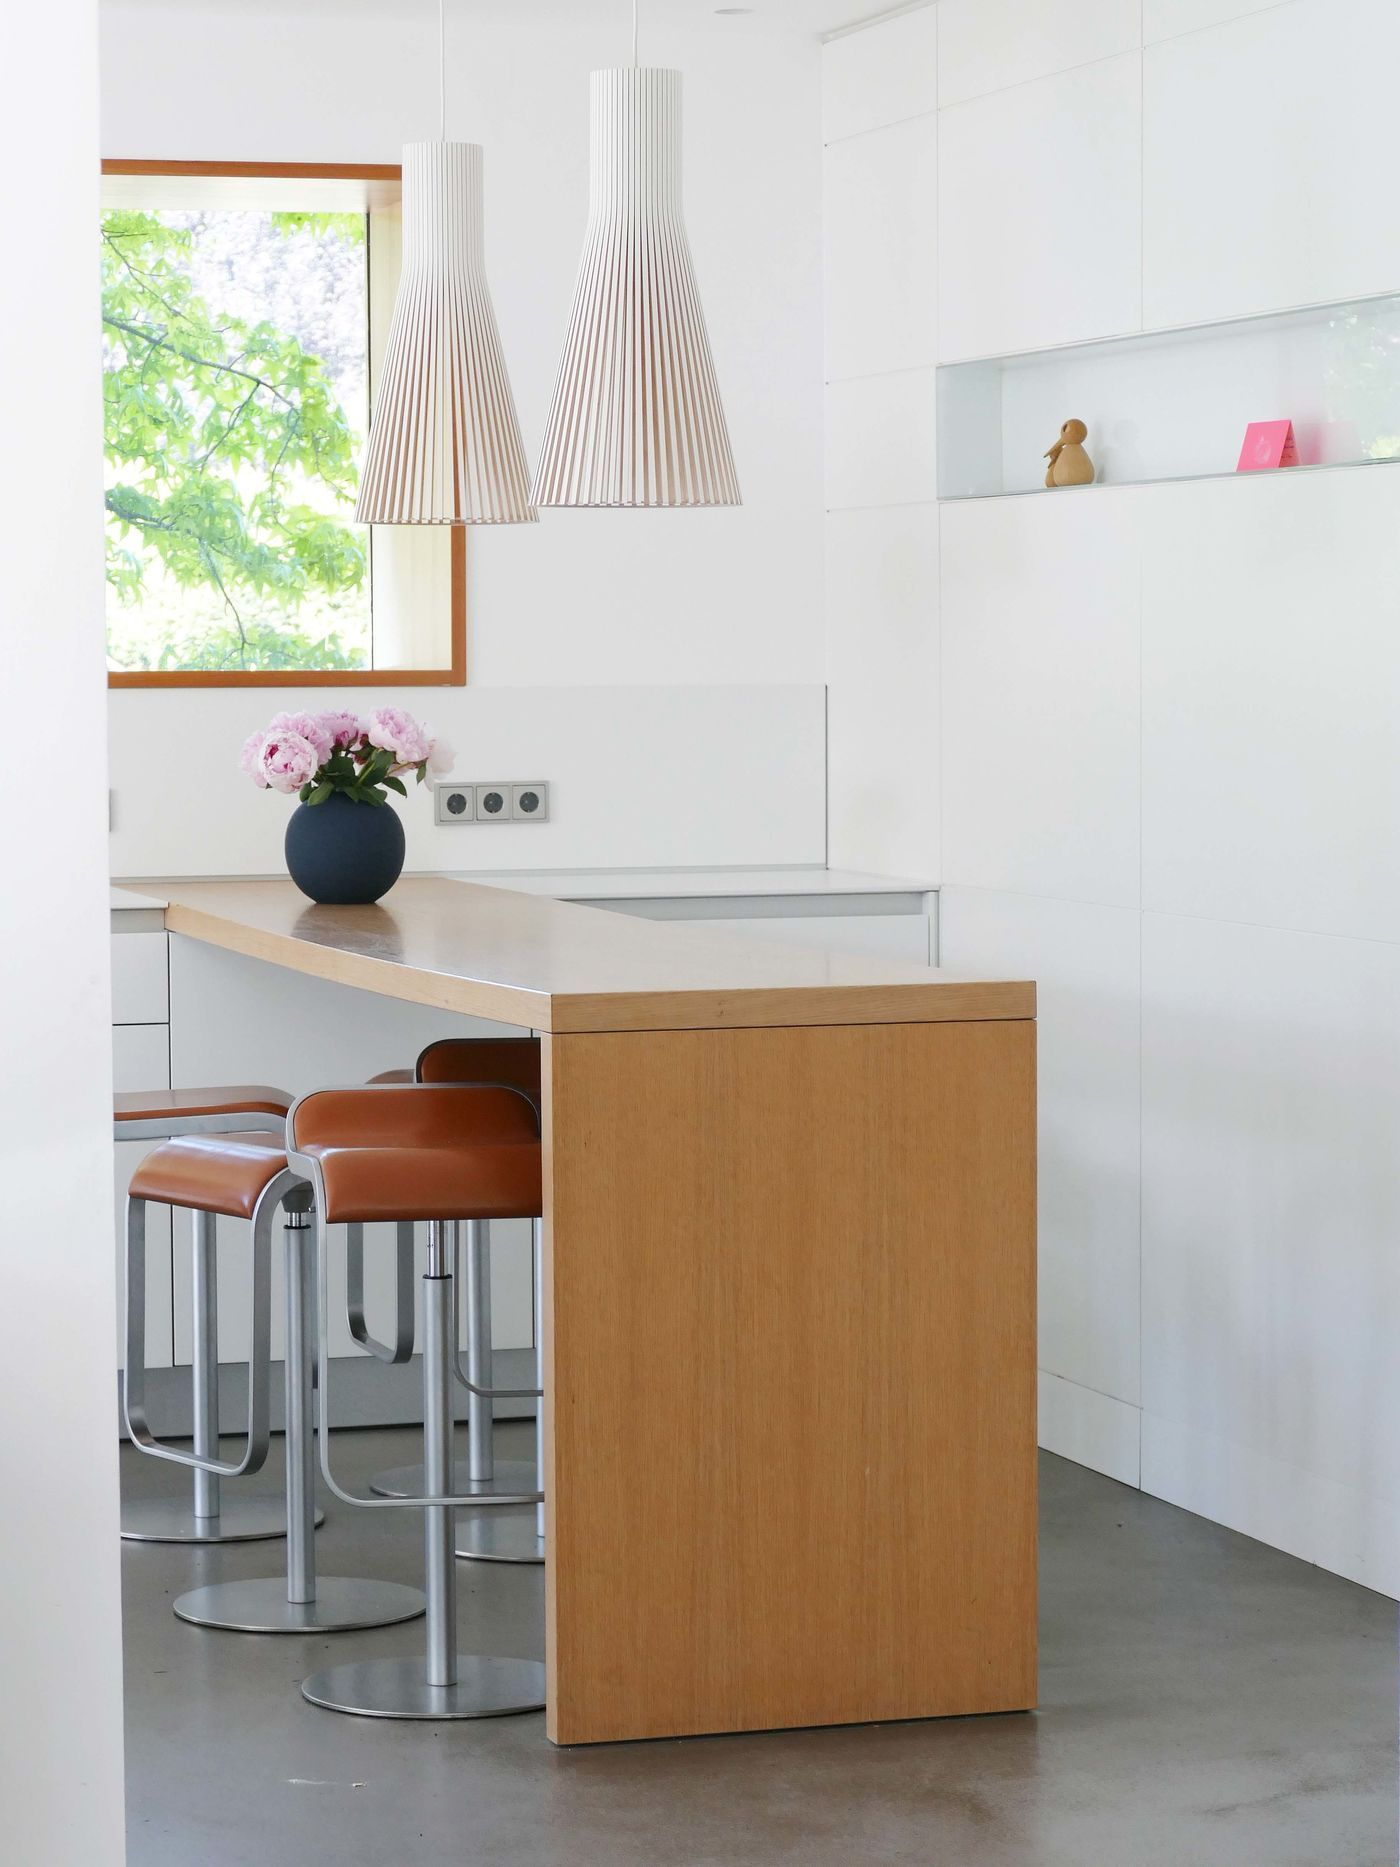 Küchentresen Ideen | Beautiful Küchentresen Selber Bauen Images ...